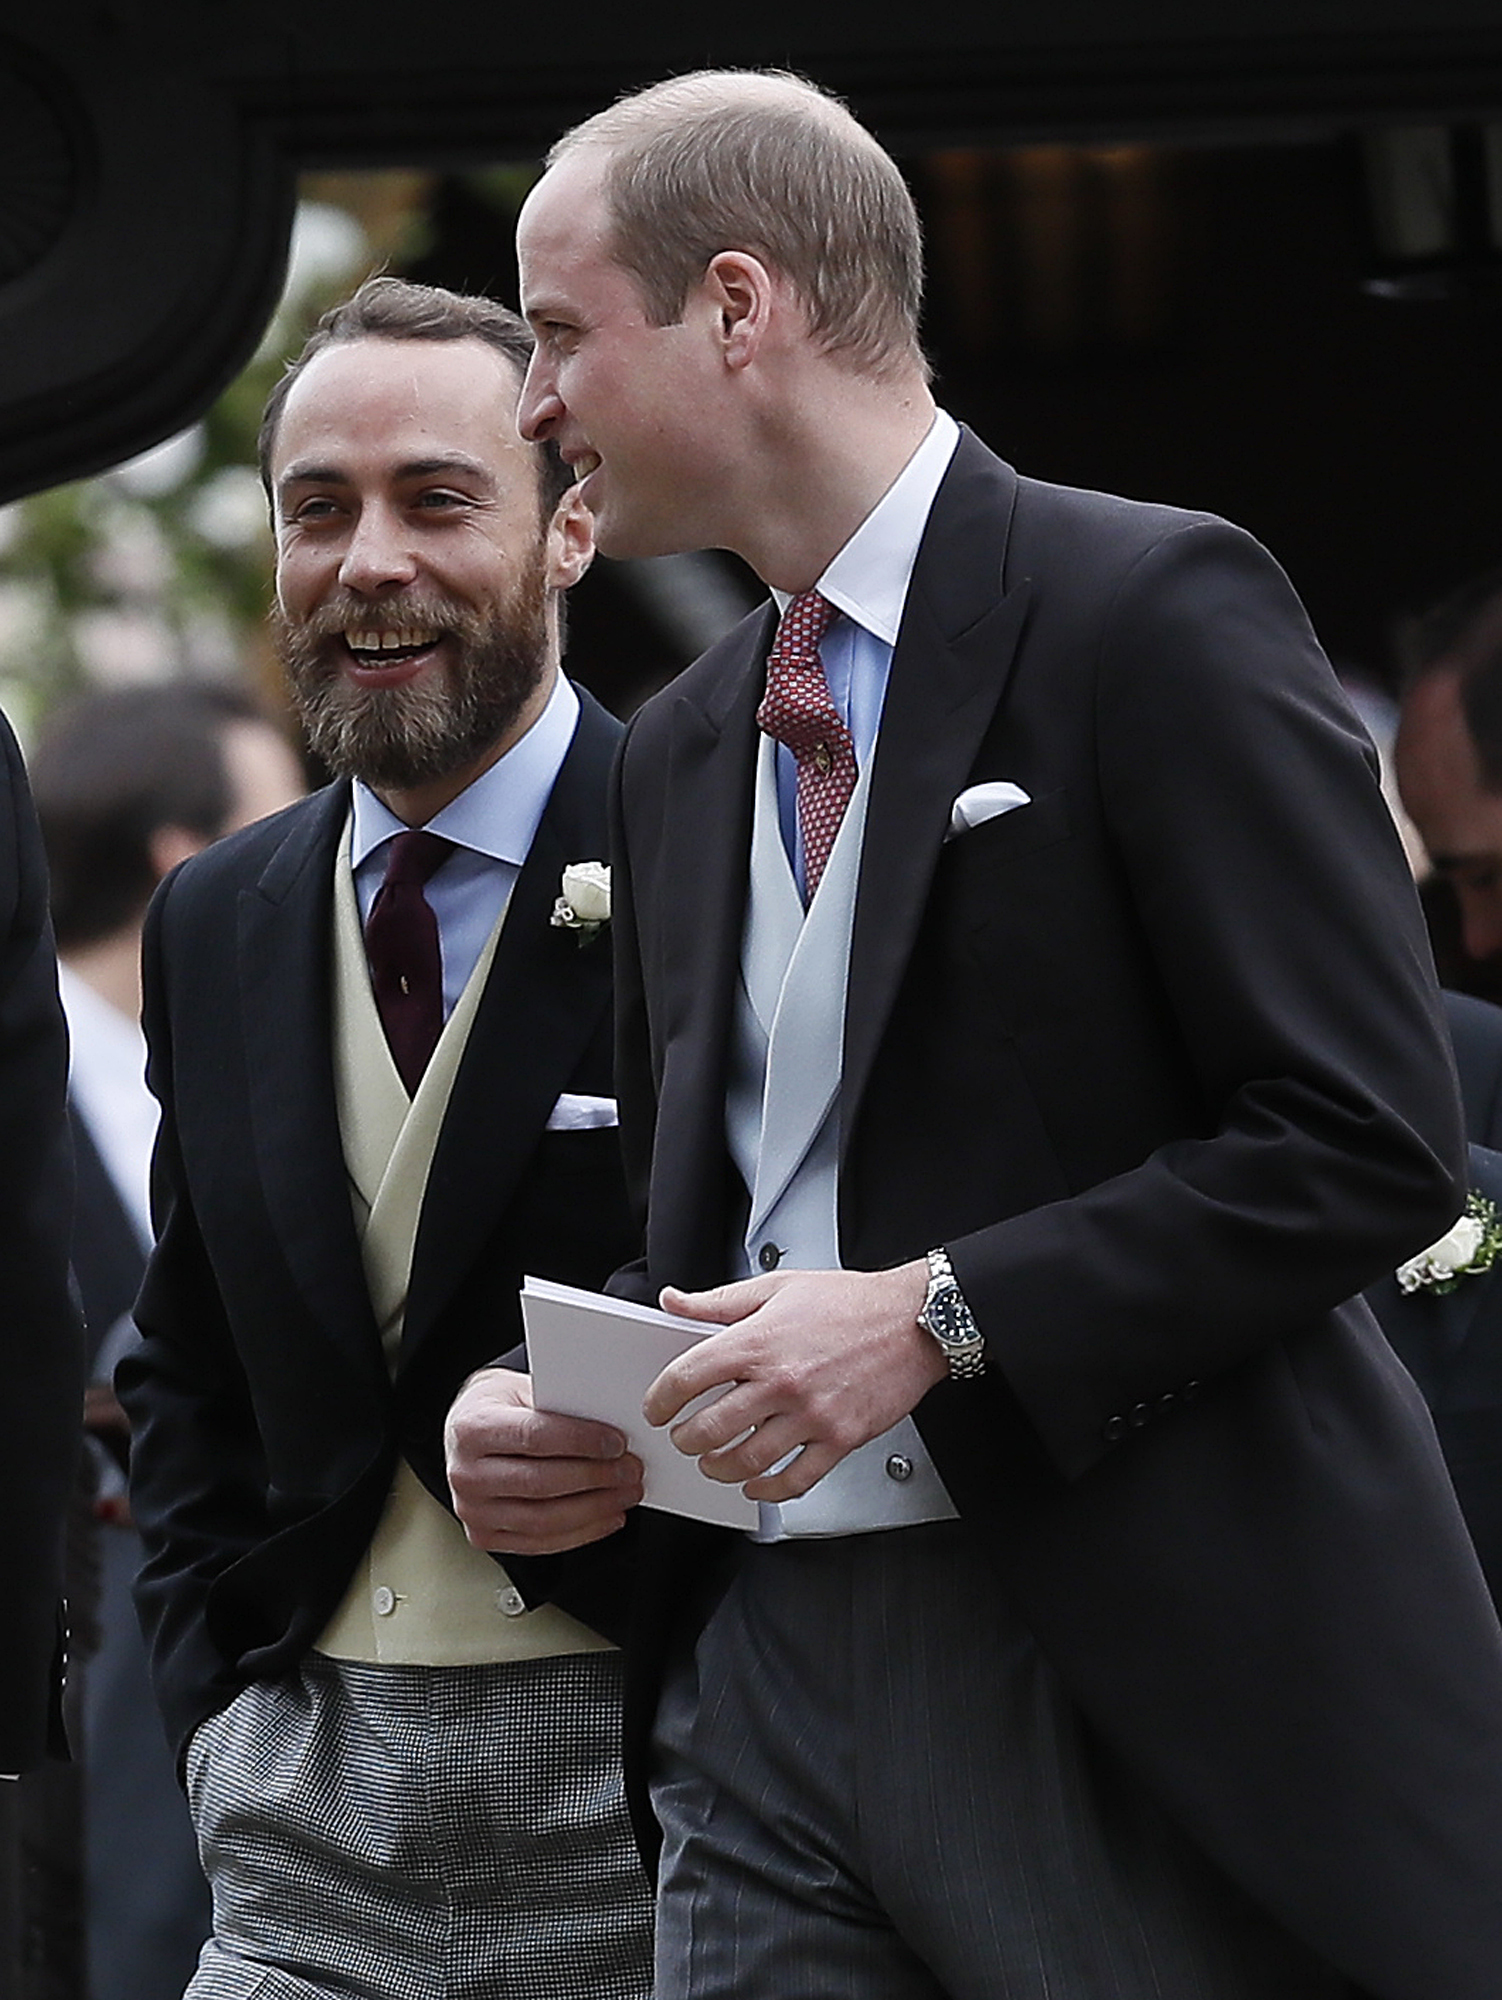 Príncipe William, James Middleton